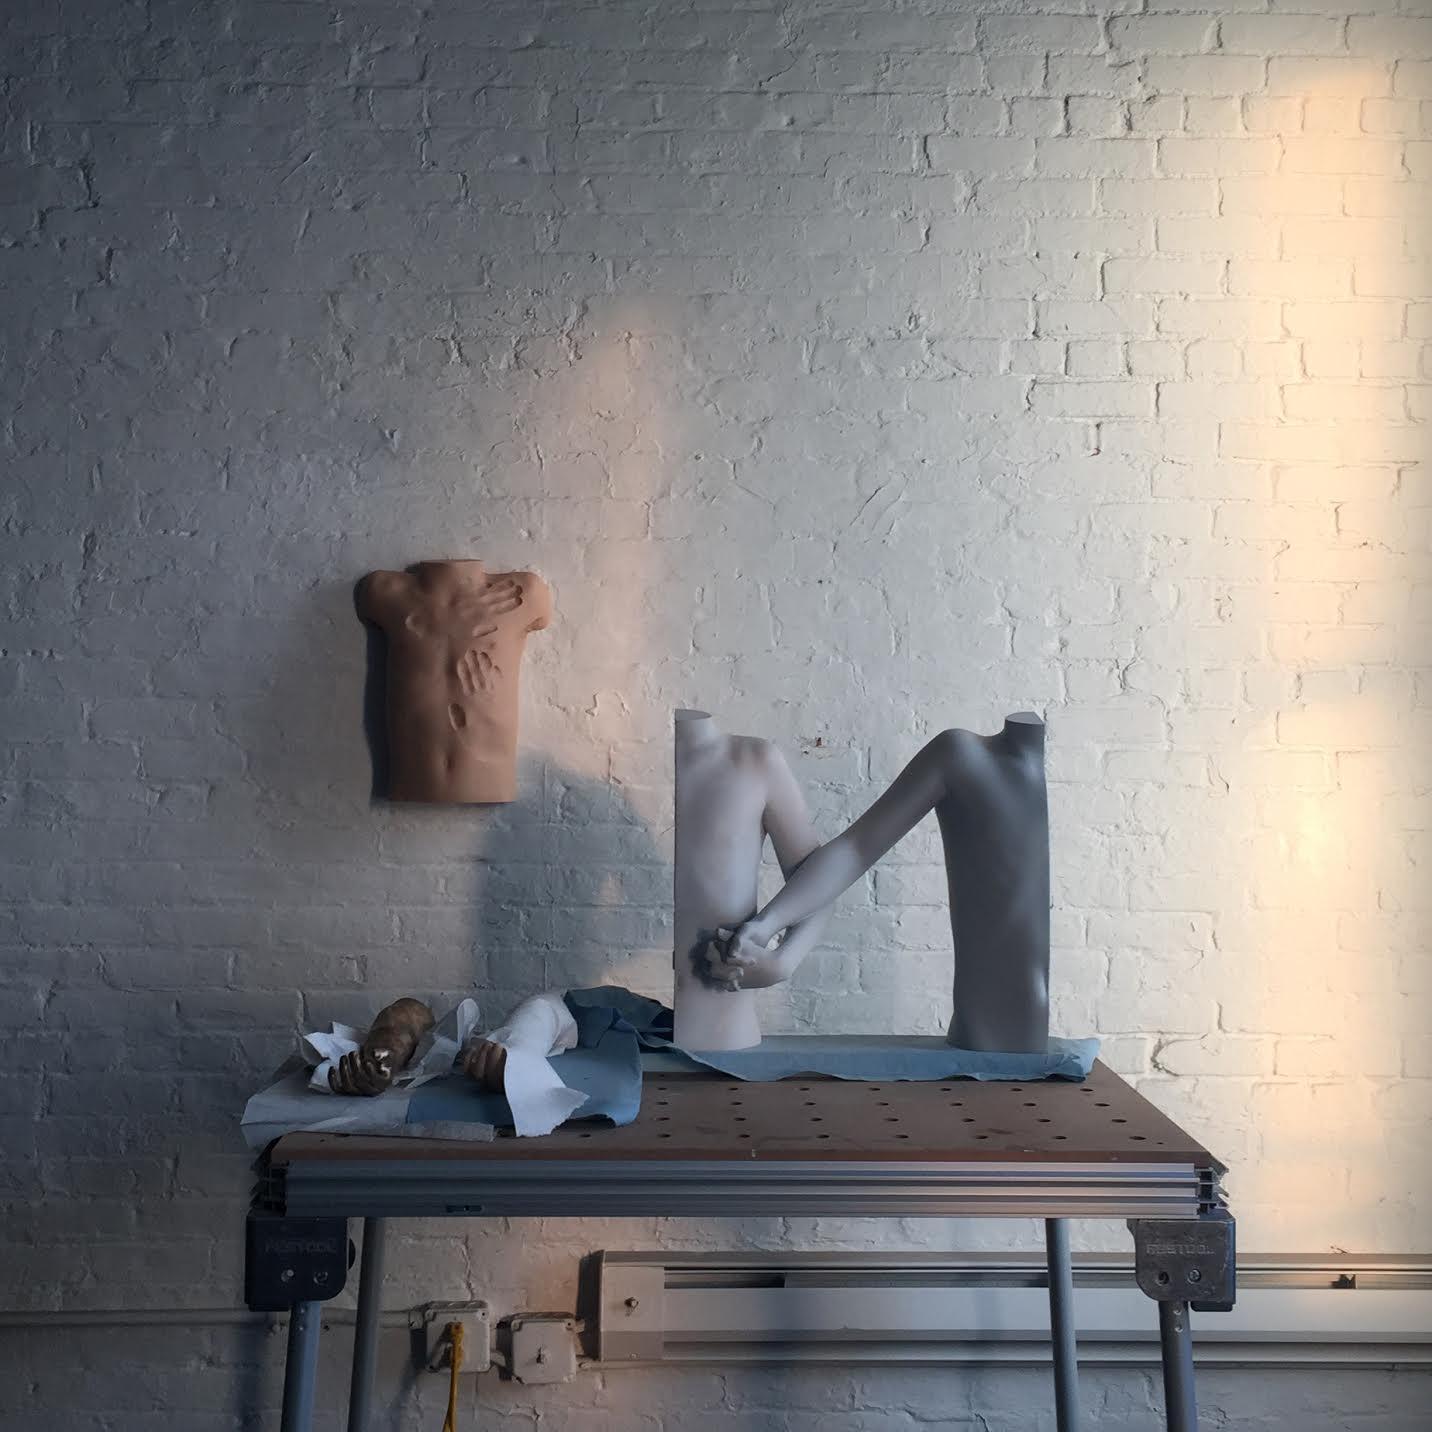 Fotografi av Stefan Sndersson från ateljén i New York.